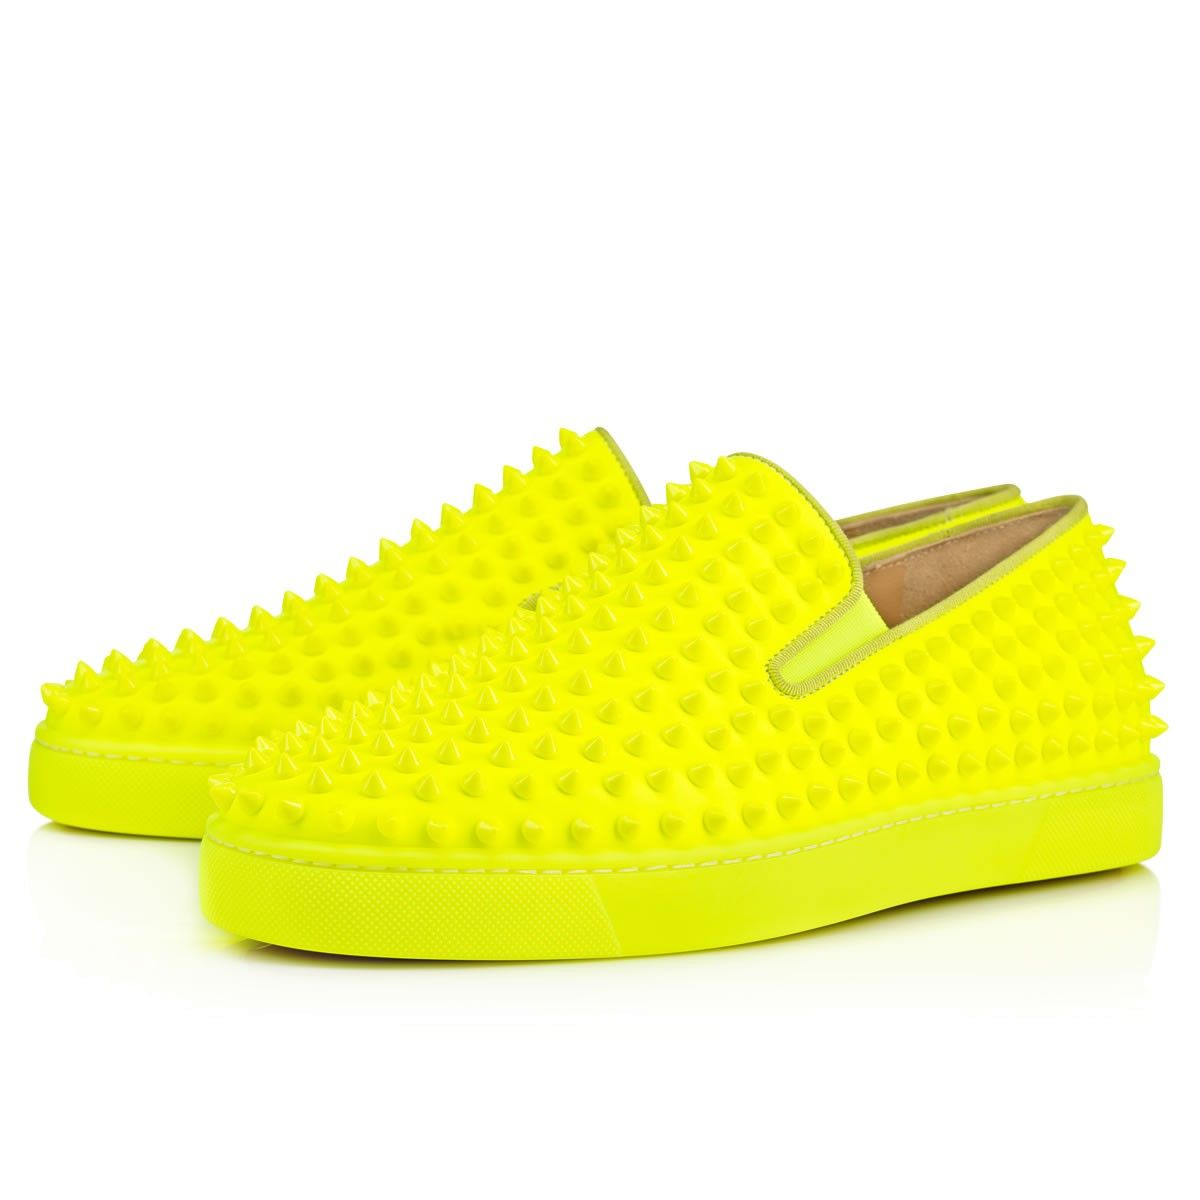 Roller pump shoes - Roller Boat Mens Flat Jaune Leather Women S Pumpsshoes